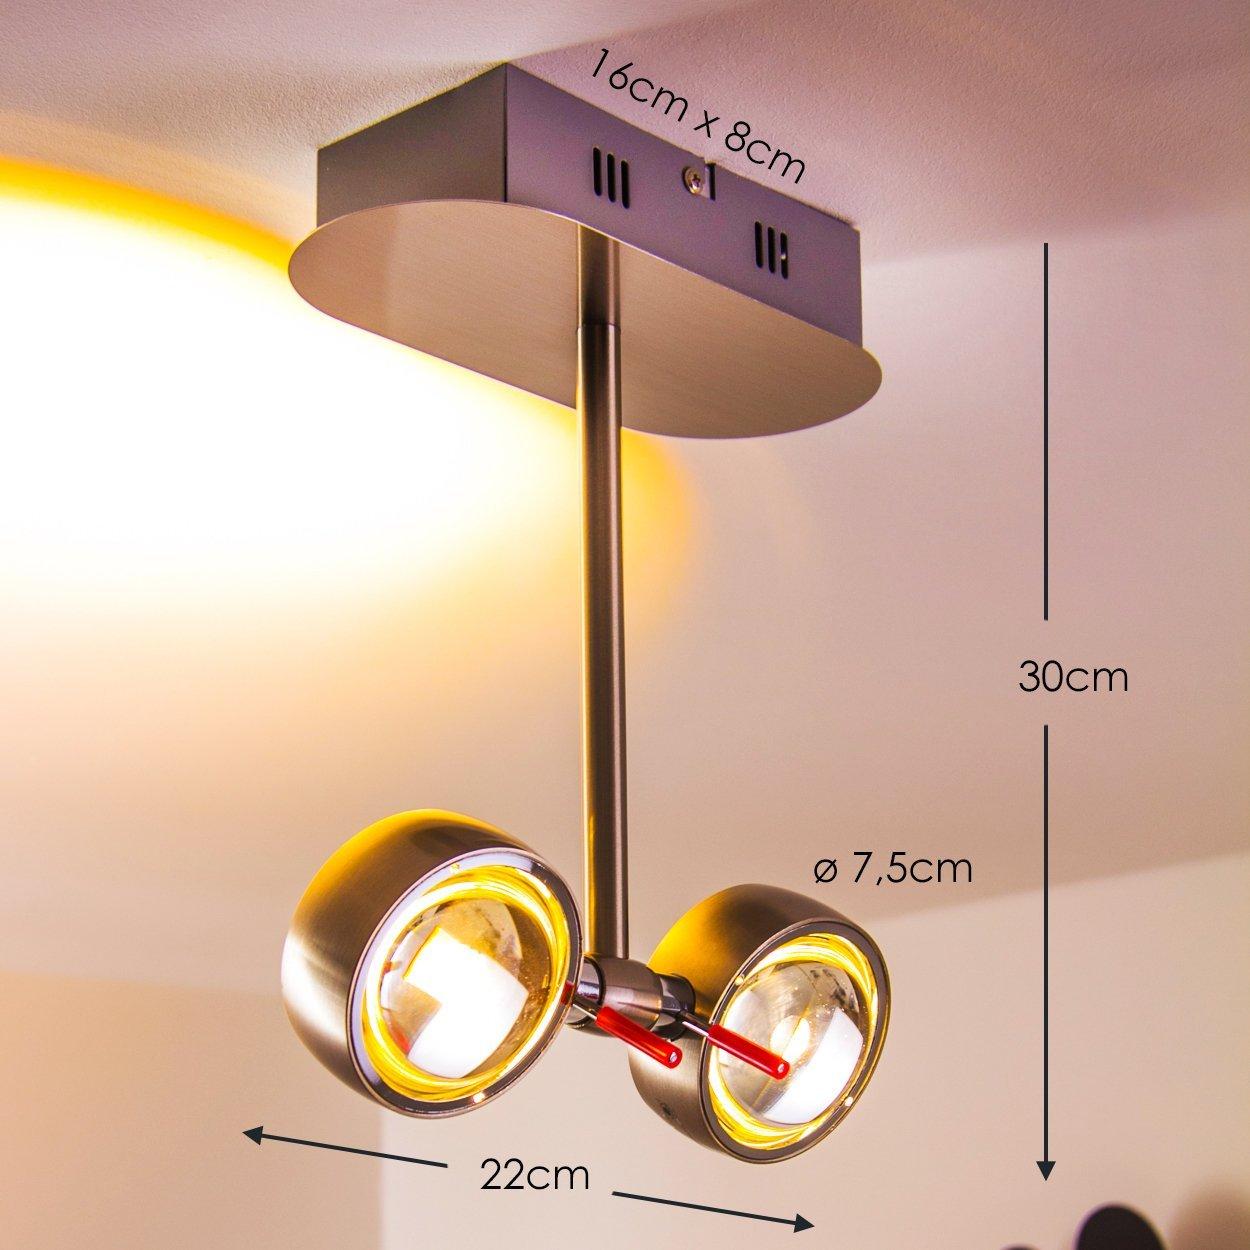 Plafonnier LED Hofstein Florence H166568 - 2 x 4,5W (Vendeur Tiers)